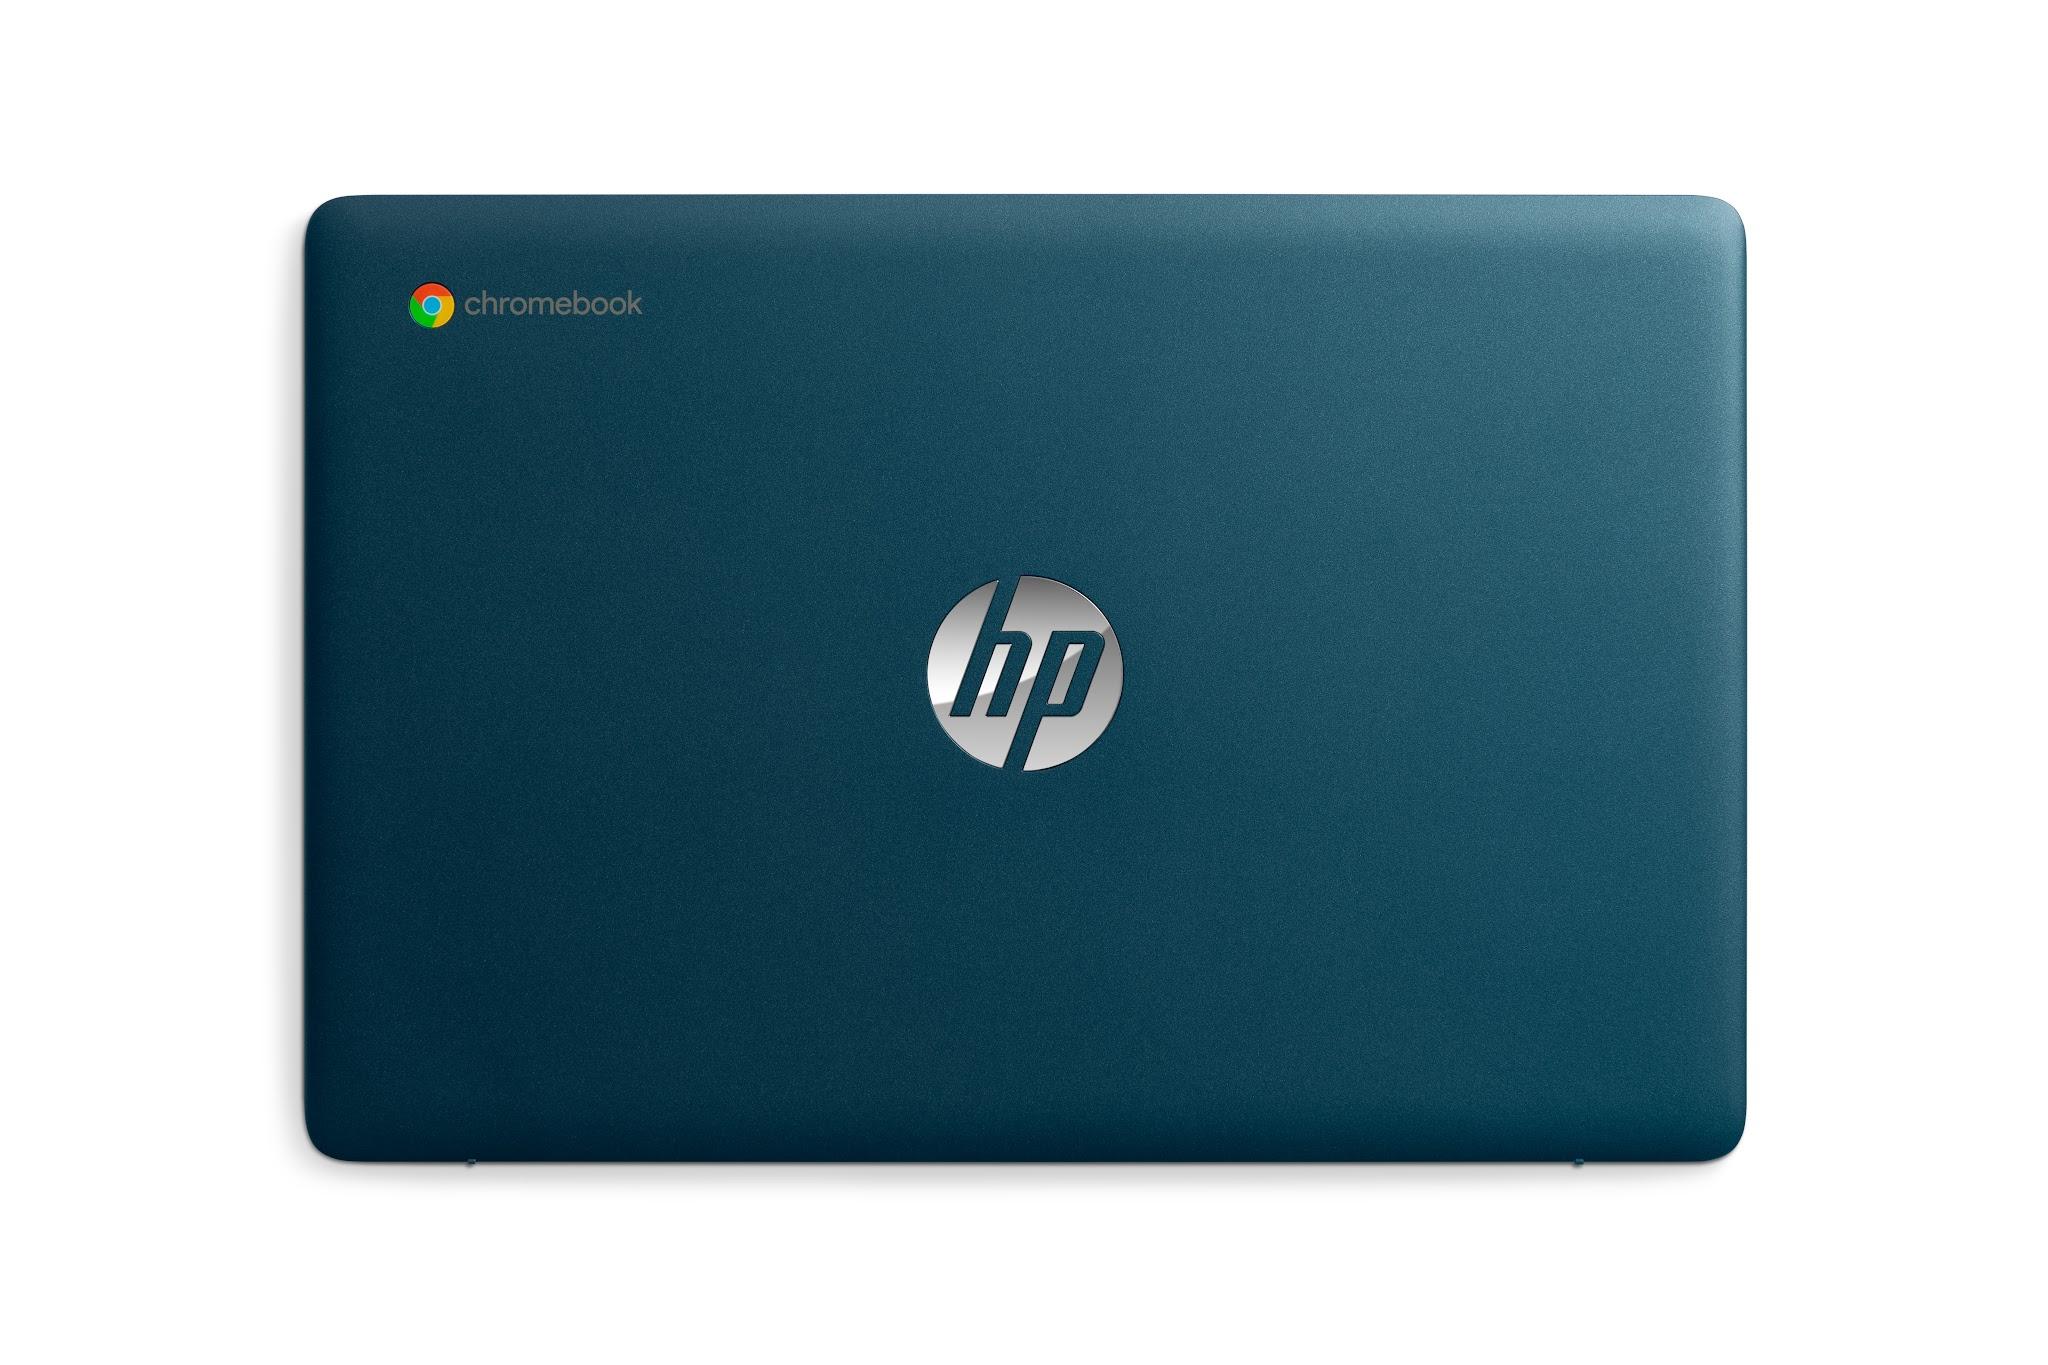 HP Chromebook 14a - photo 12